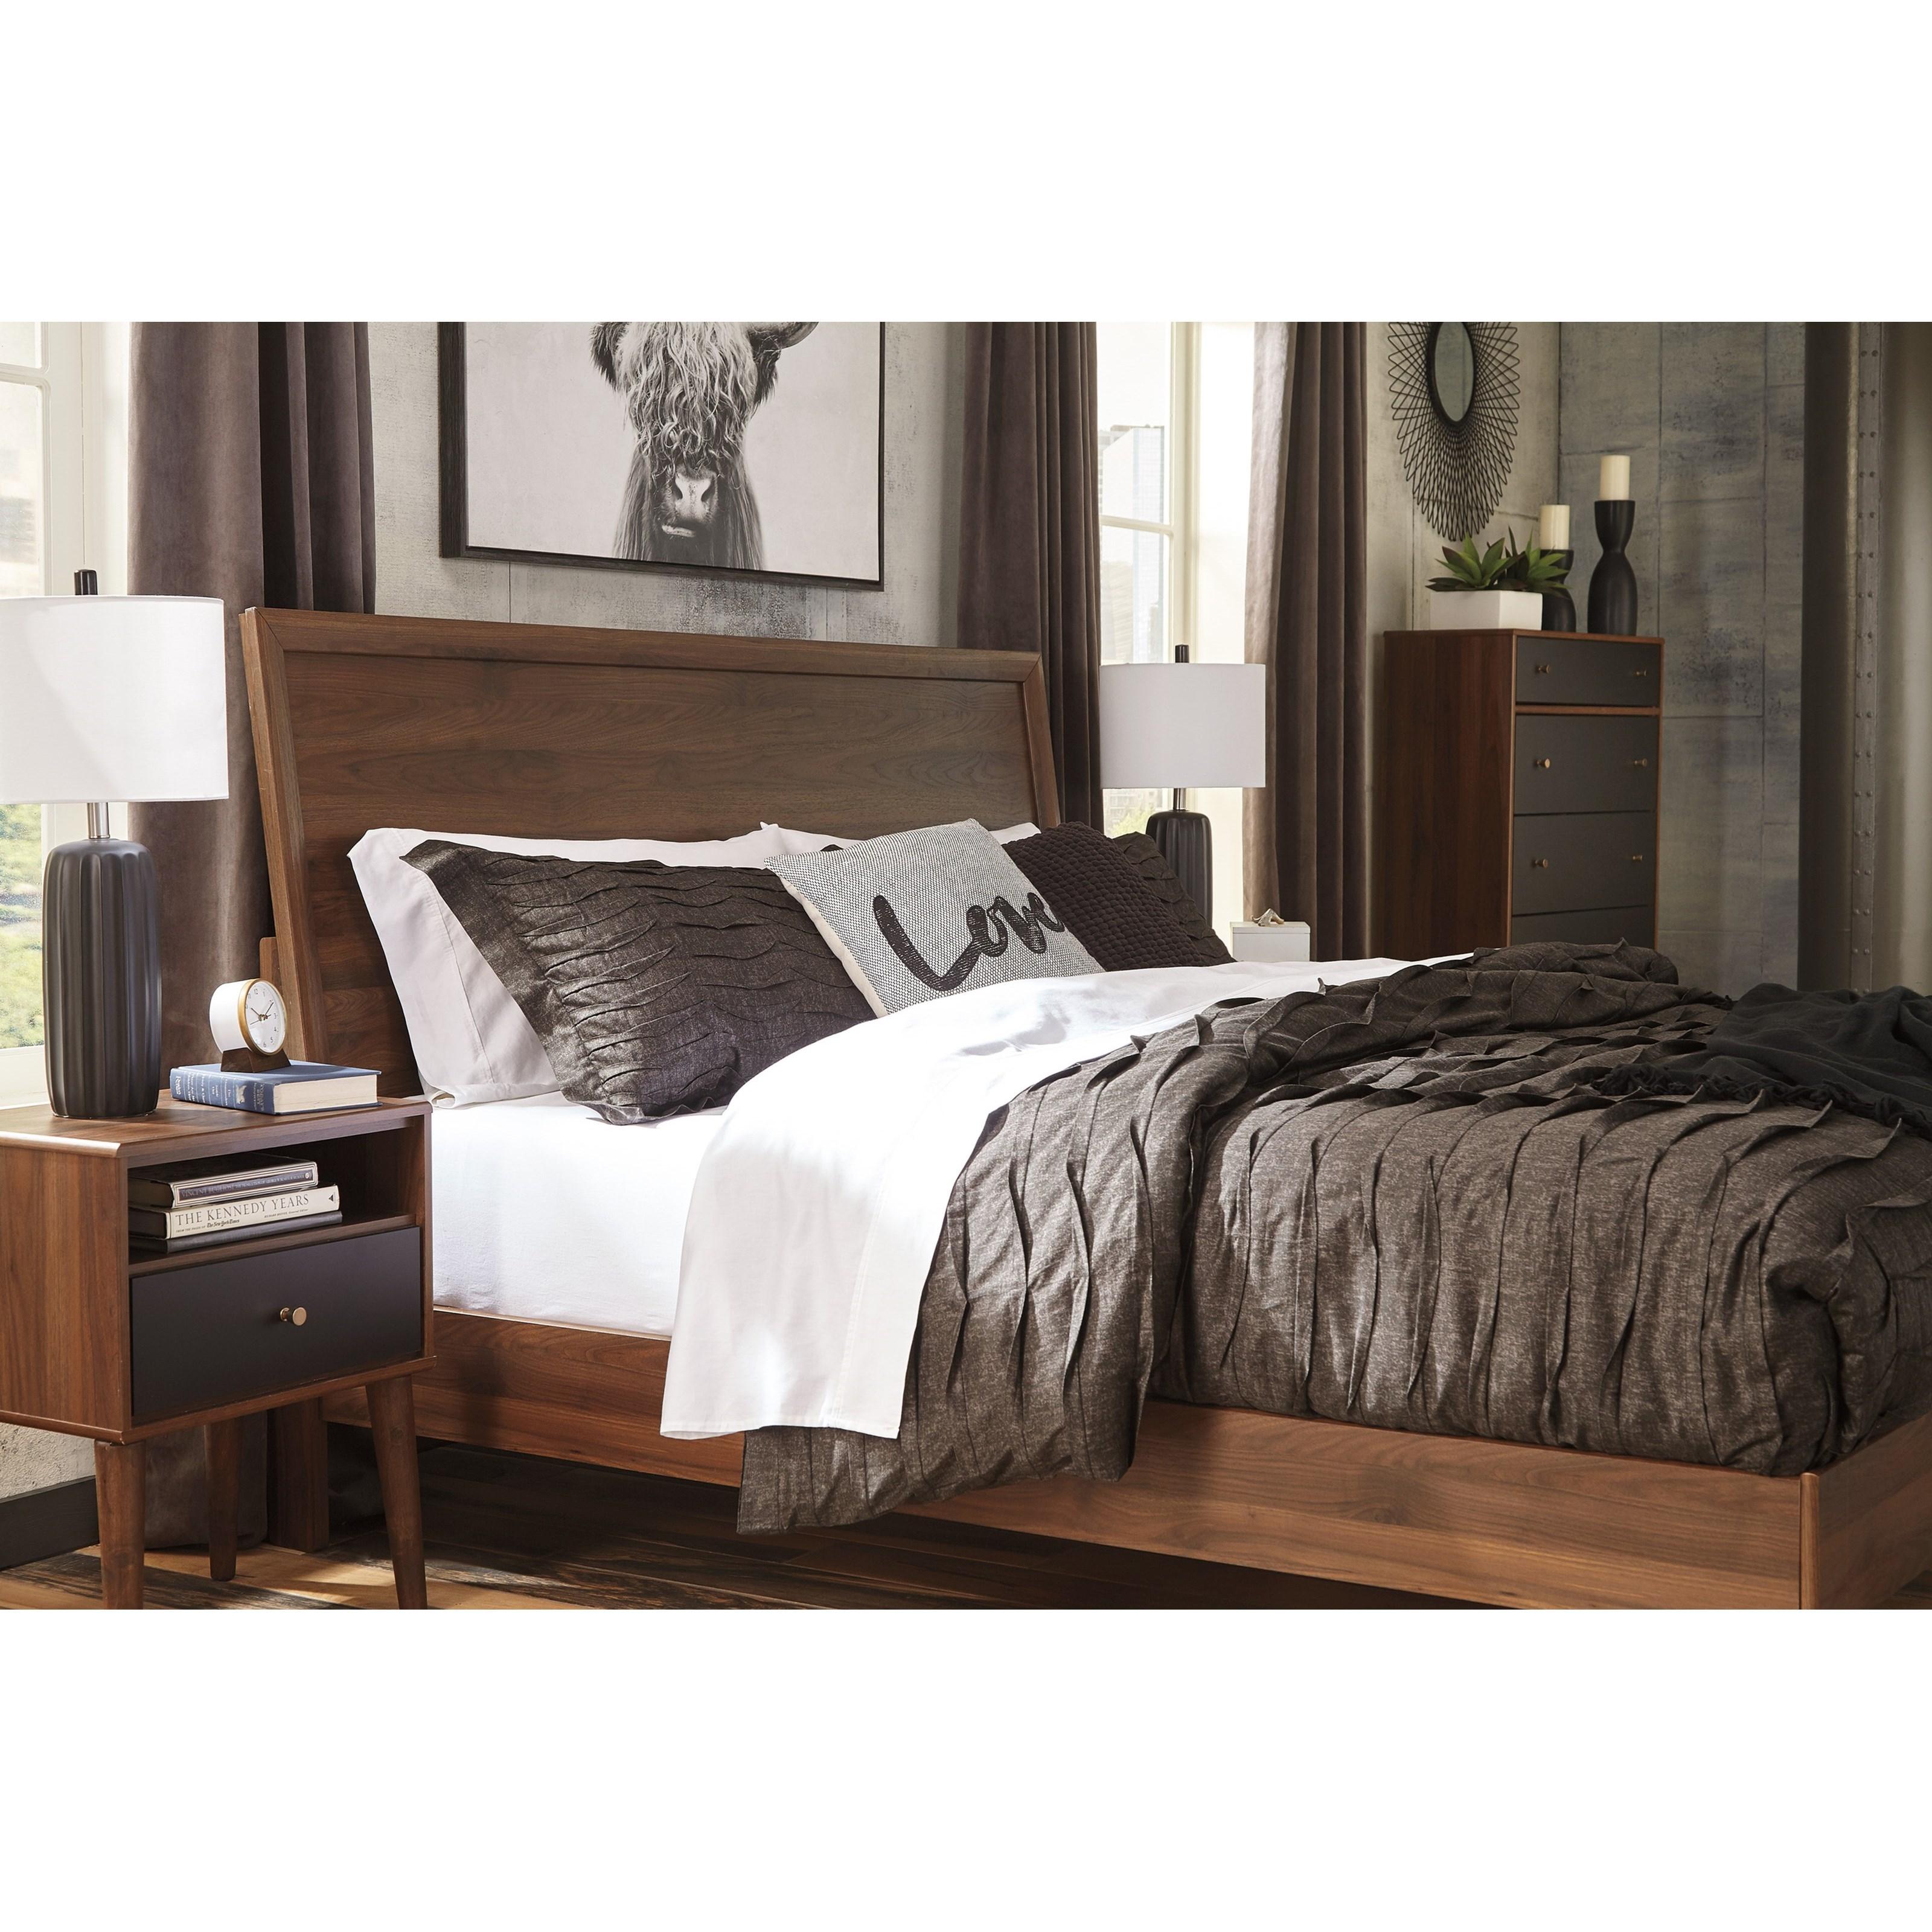 Ashley Furniture In Brandon Fl: Signature Design By Ashley Daneston Mid-Century Modern